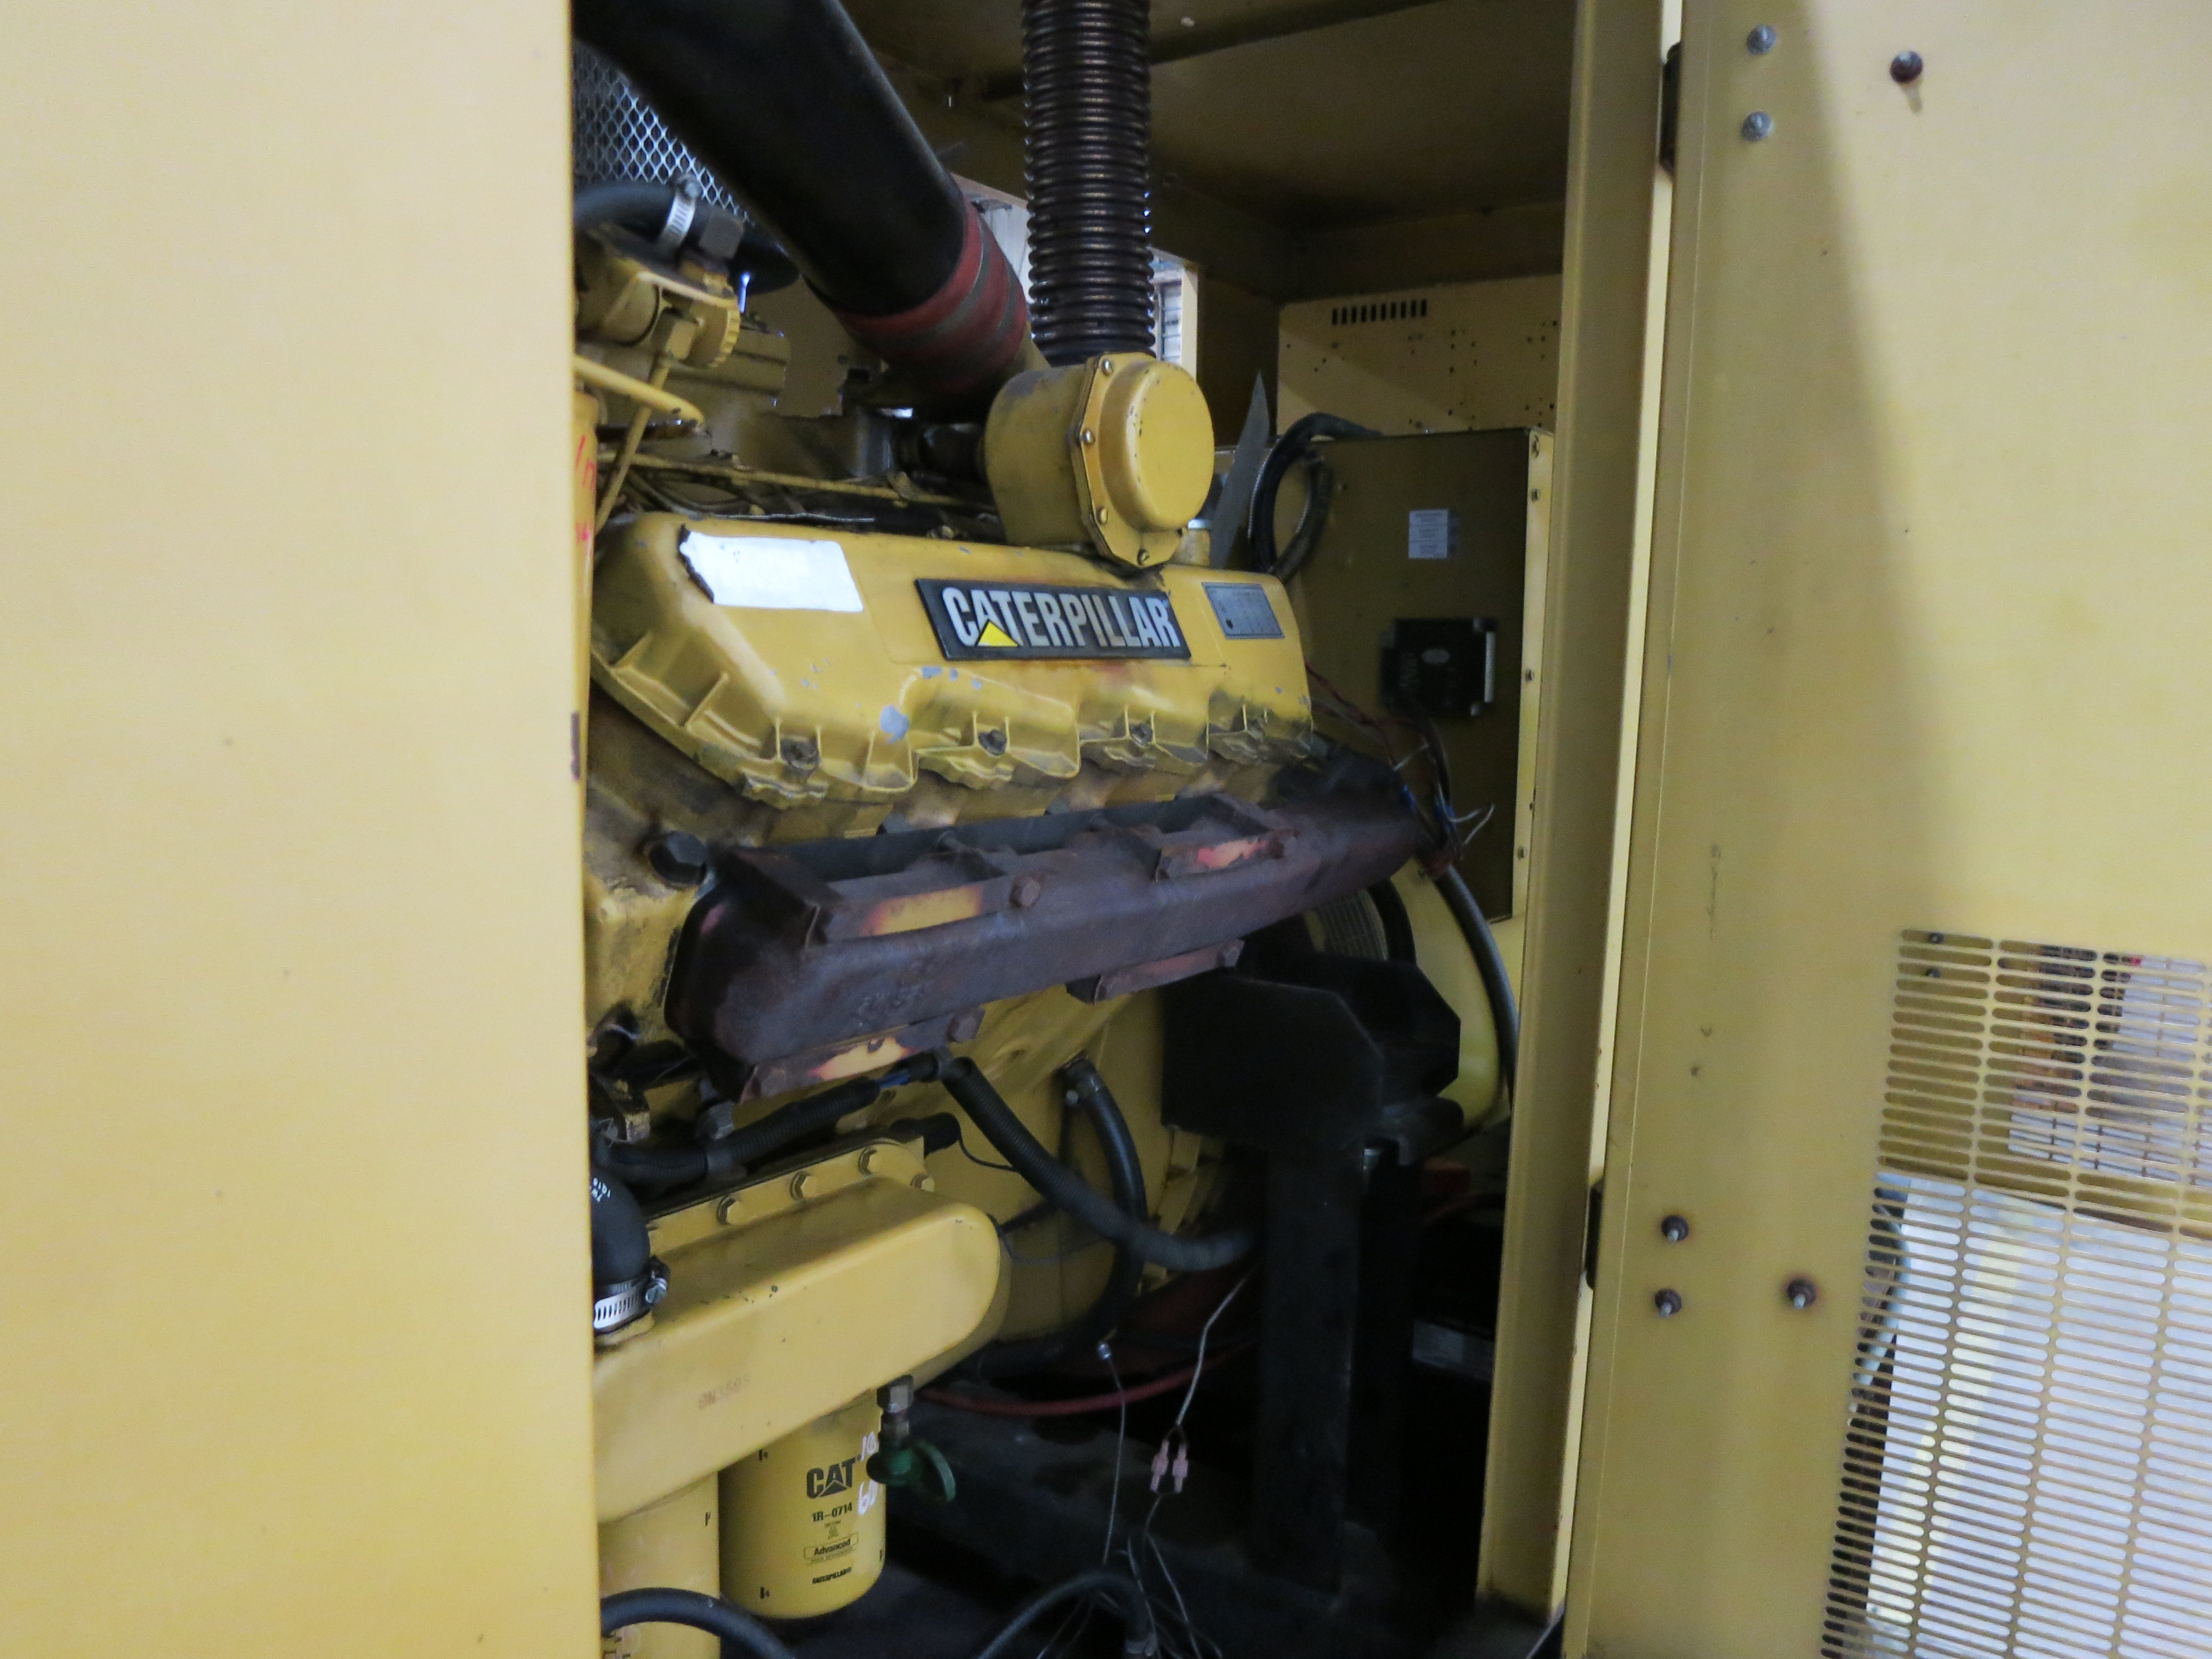 Used Caterpillar 3208 Diesel Generator 667 Hrs